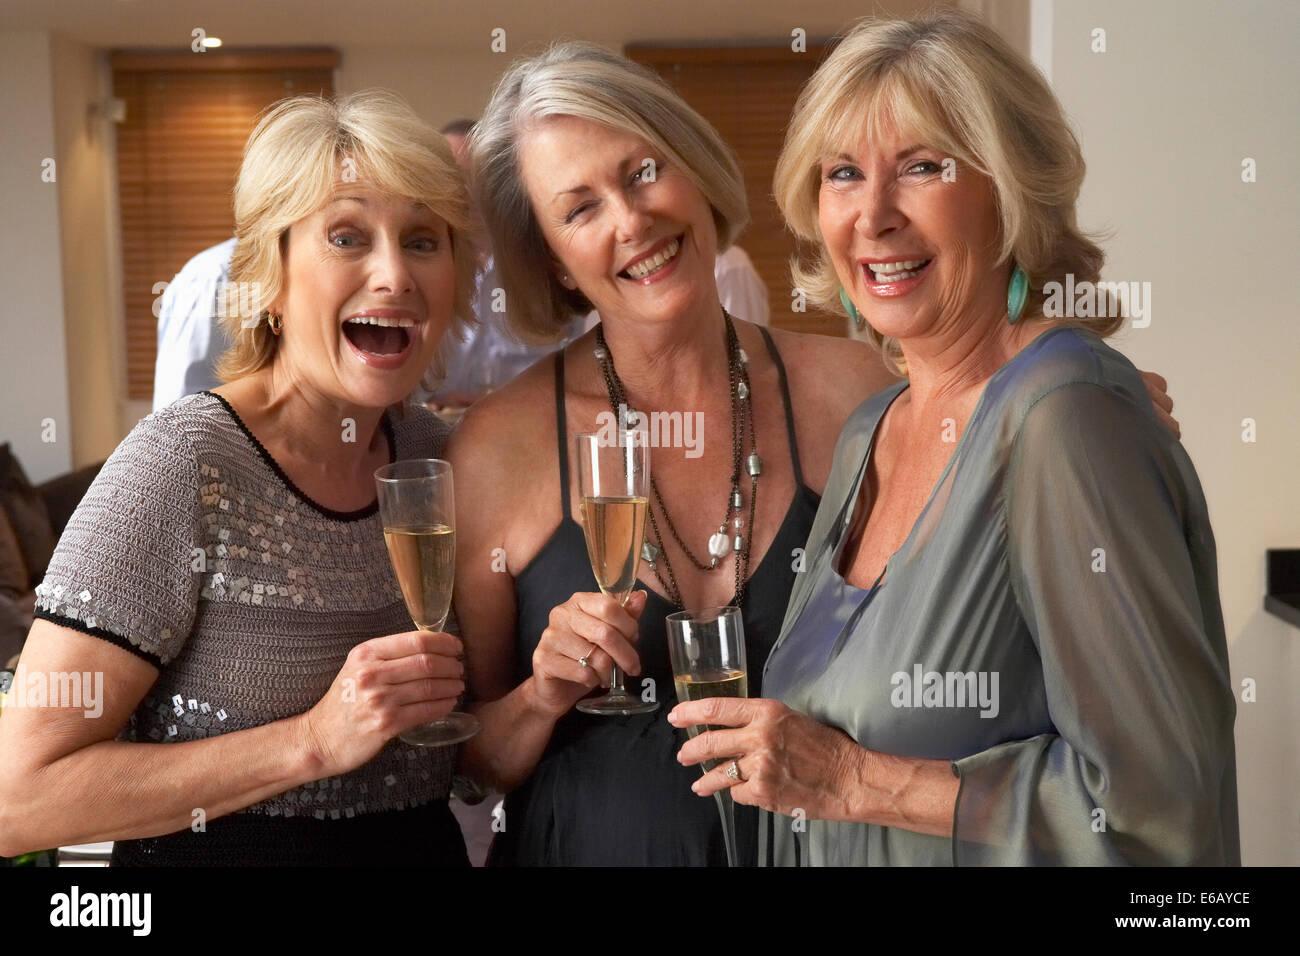 celebrations,friends,sociability - Stock Image